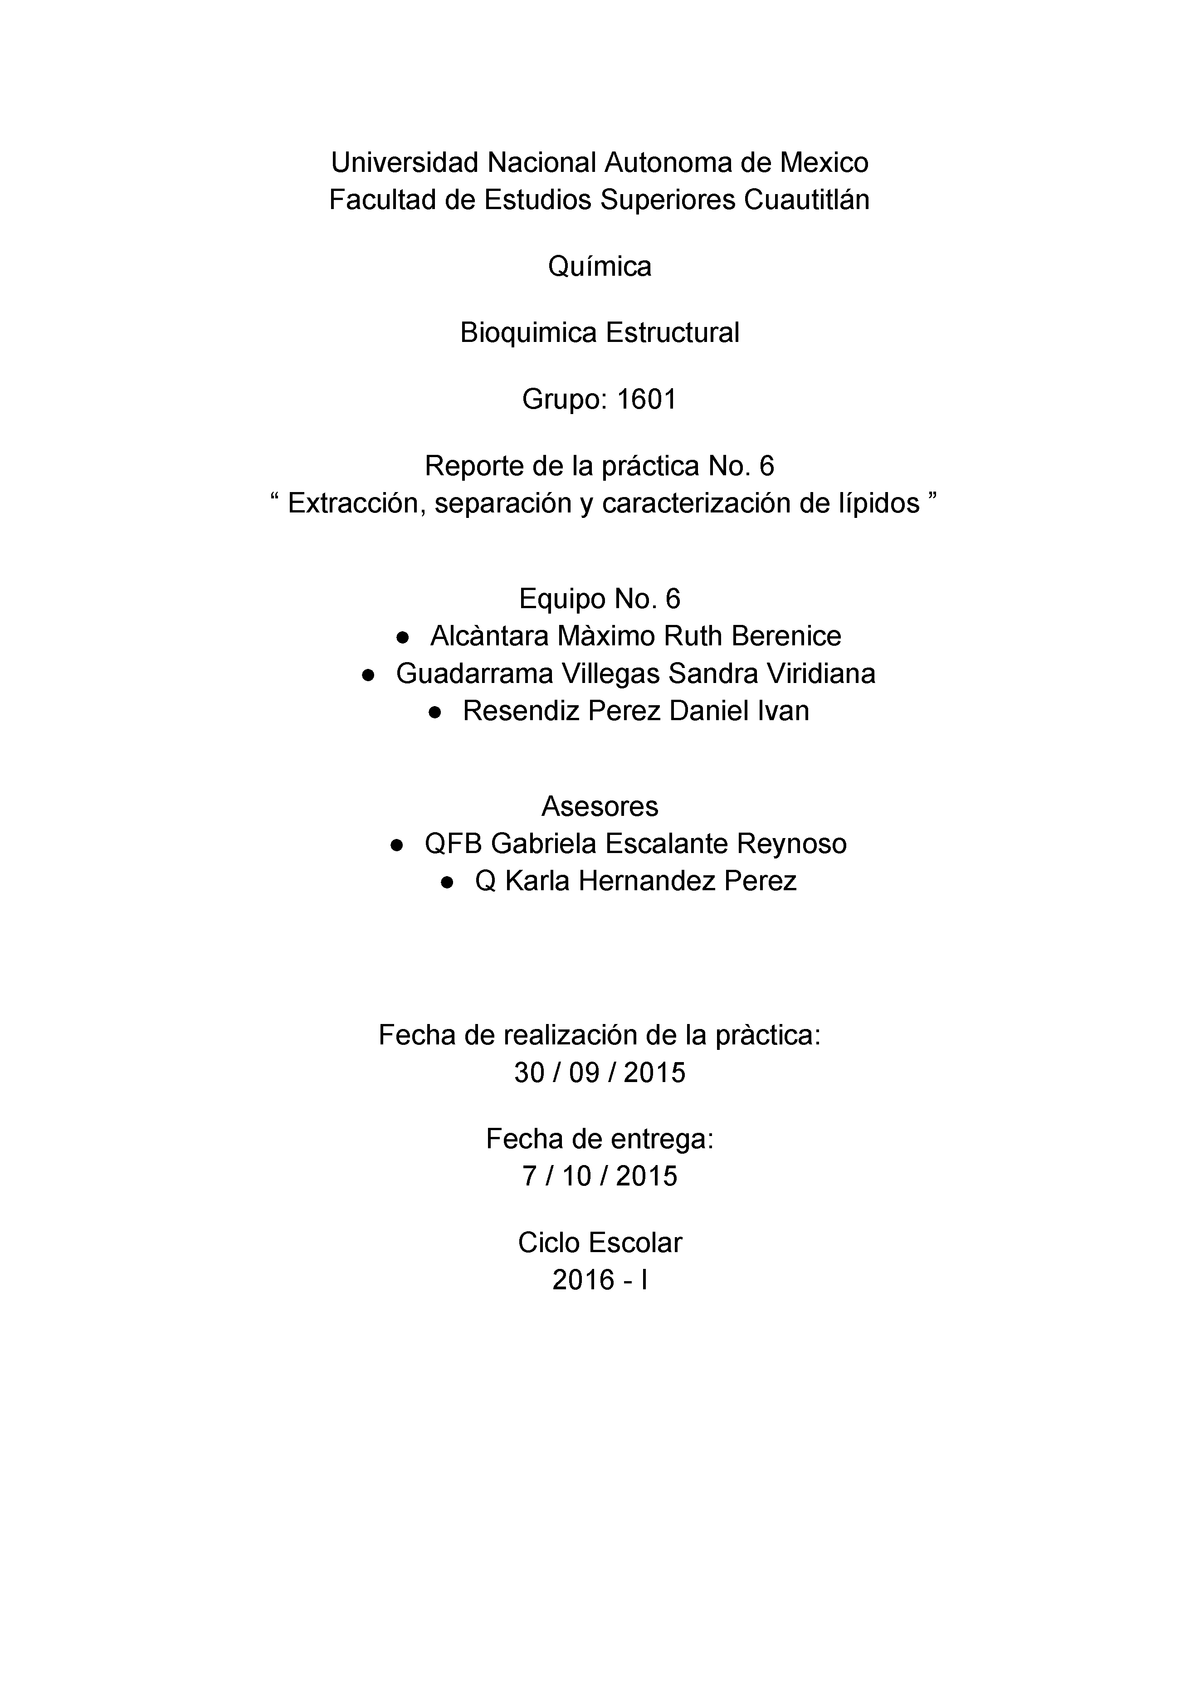 Reporte De Práctica 6 Lípidos Pdf Bioquimica Unam Studocu